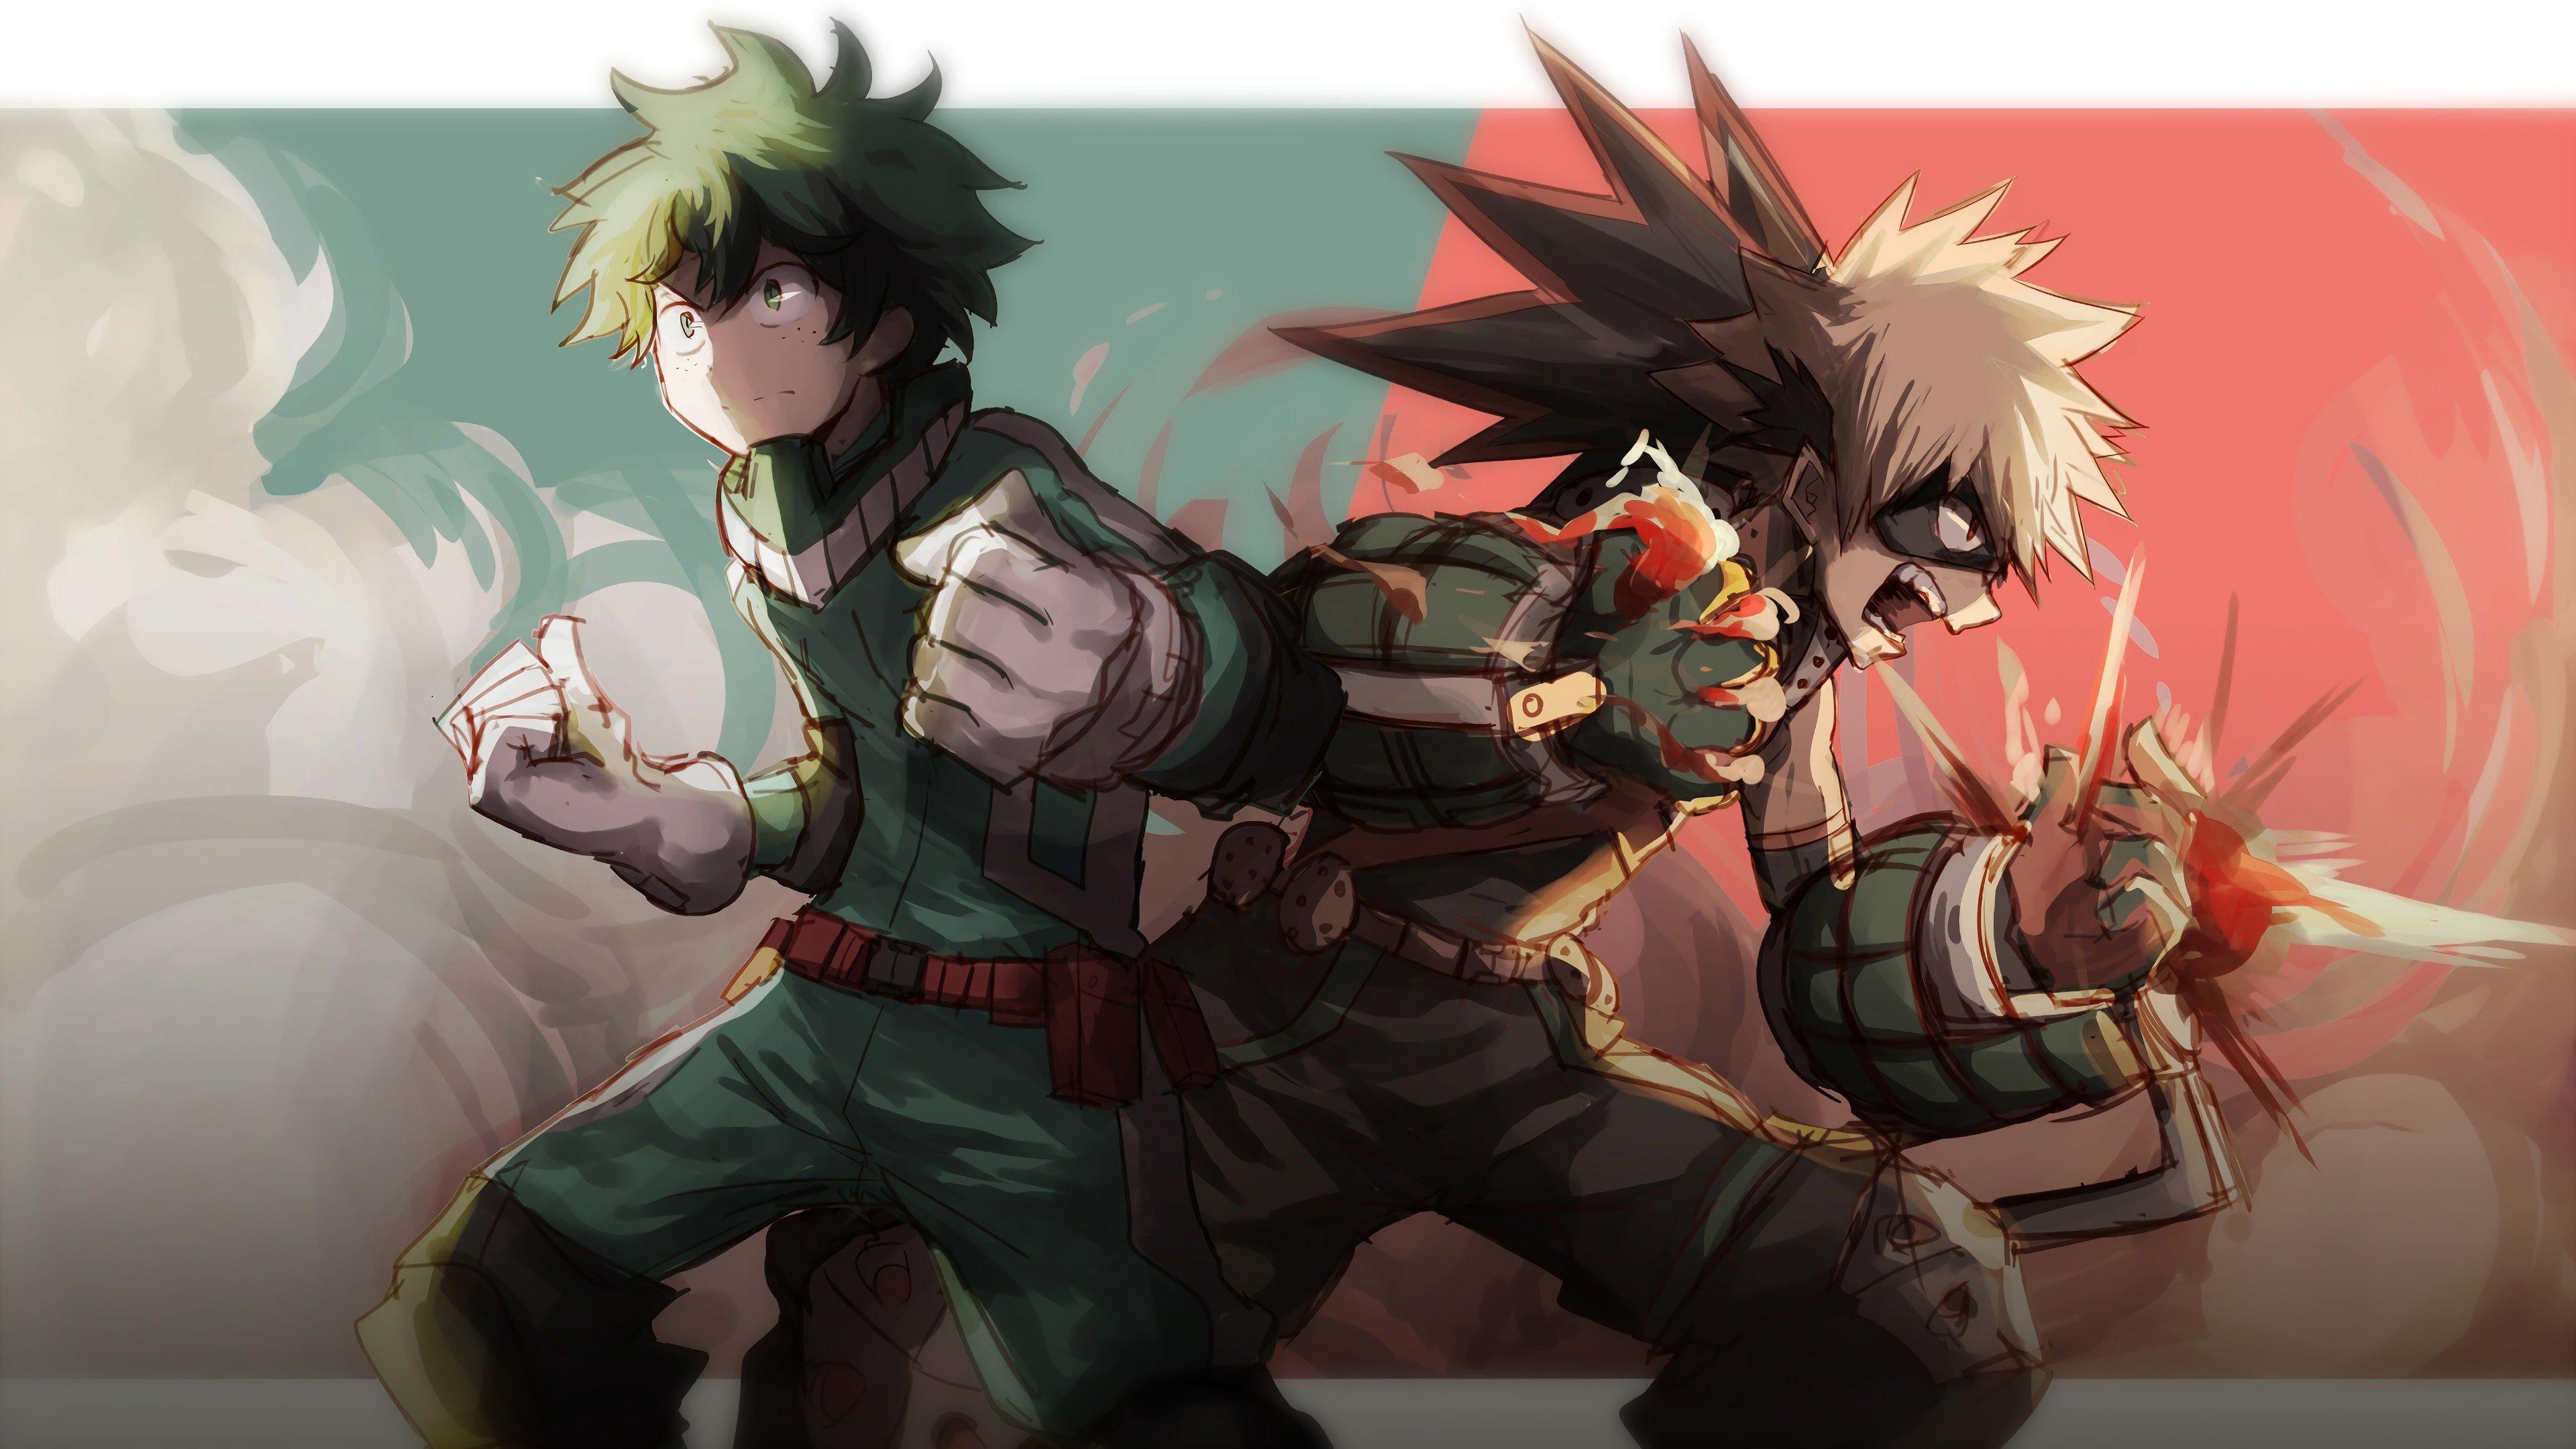 Katsuki Bakugou And Izuku Midoriya My Hero Academia Anime